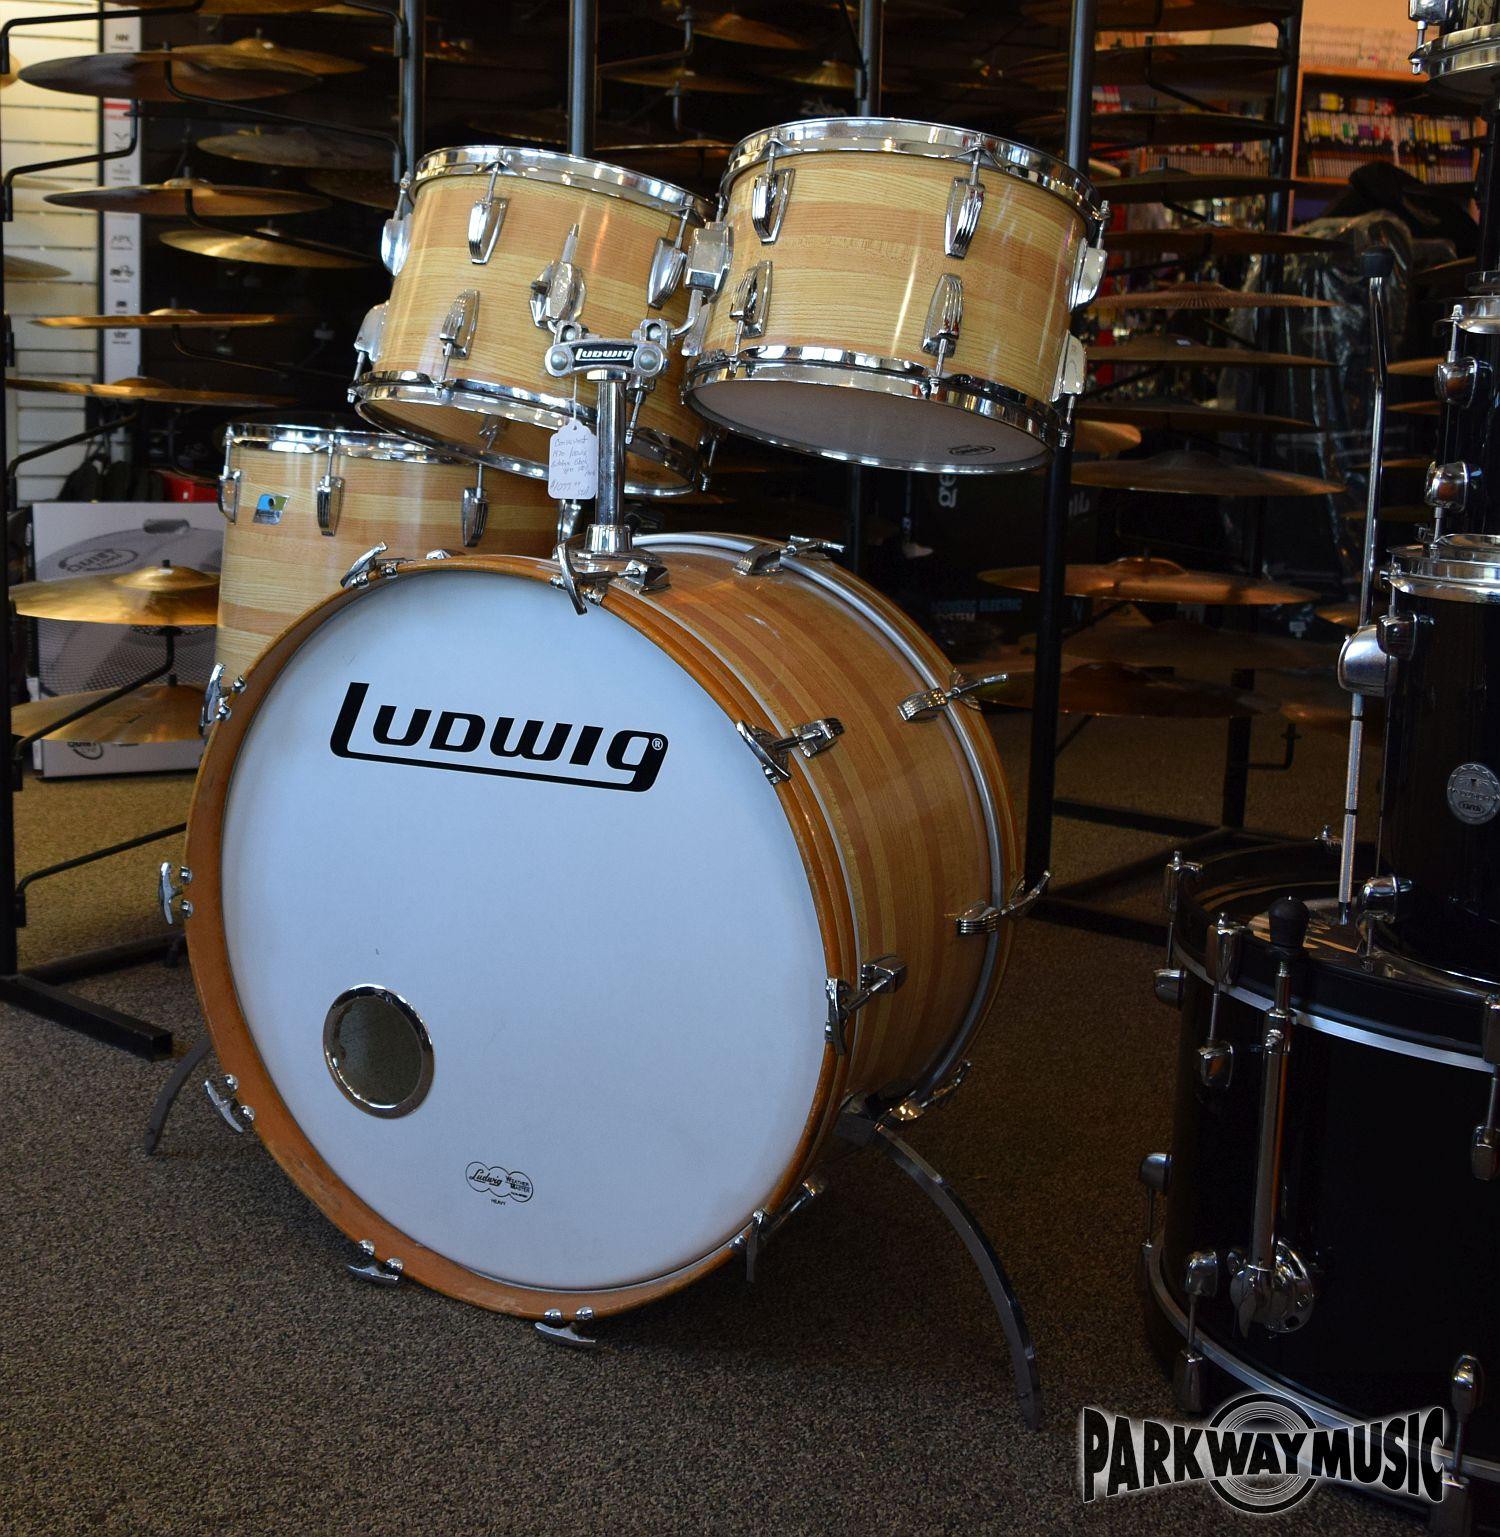 Ludwig Vintage Butcher Block Drum Set 1970's (USED) SOLD